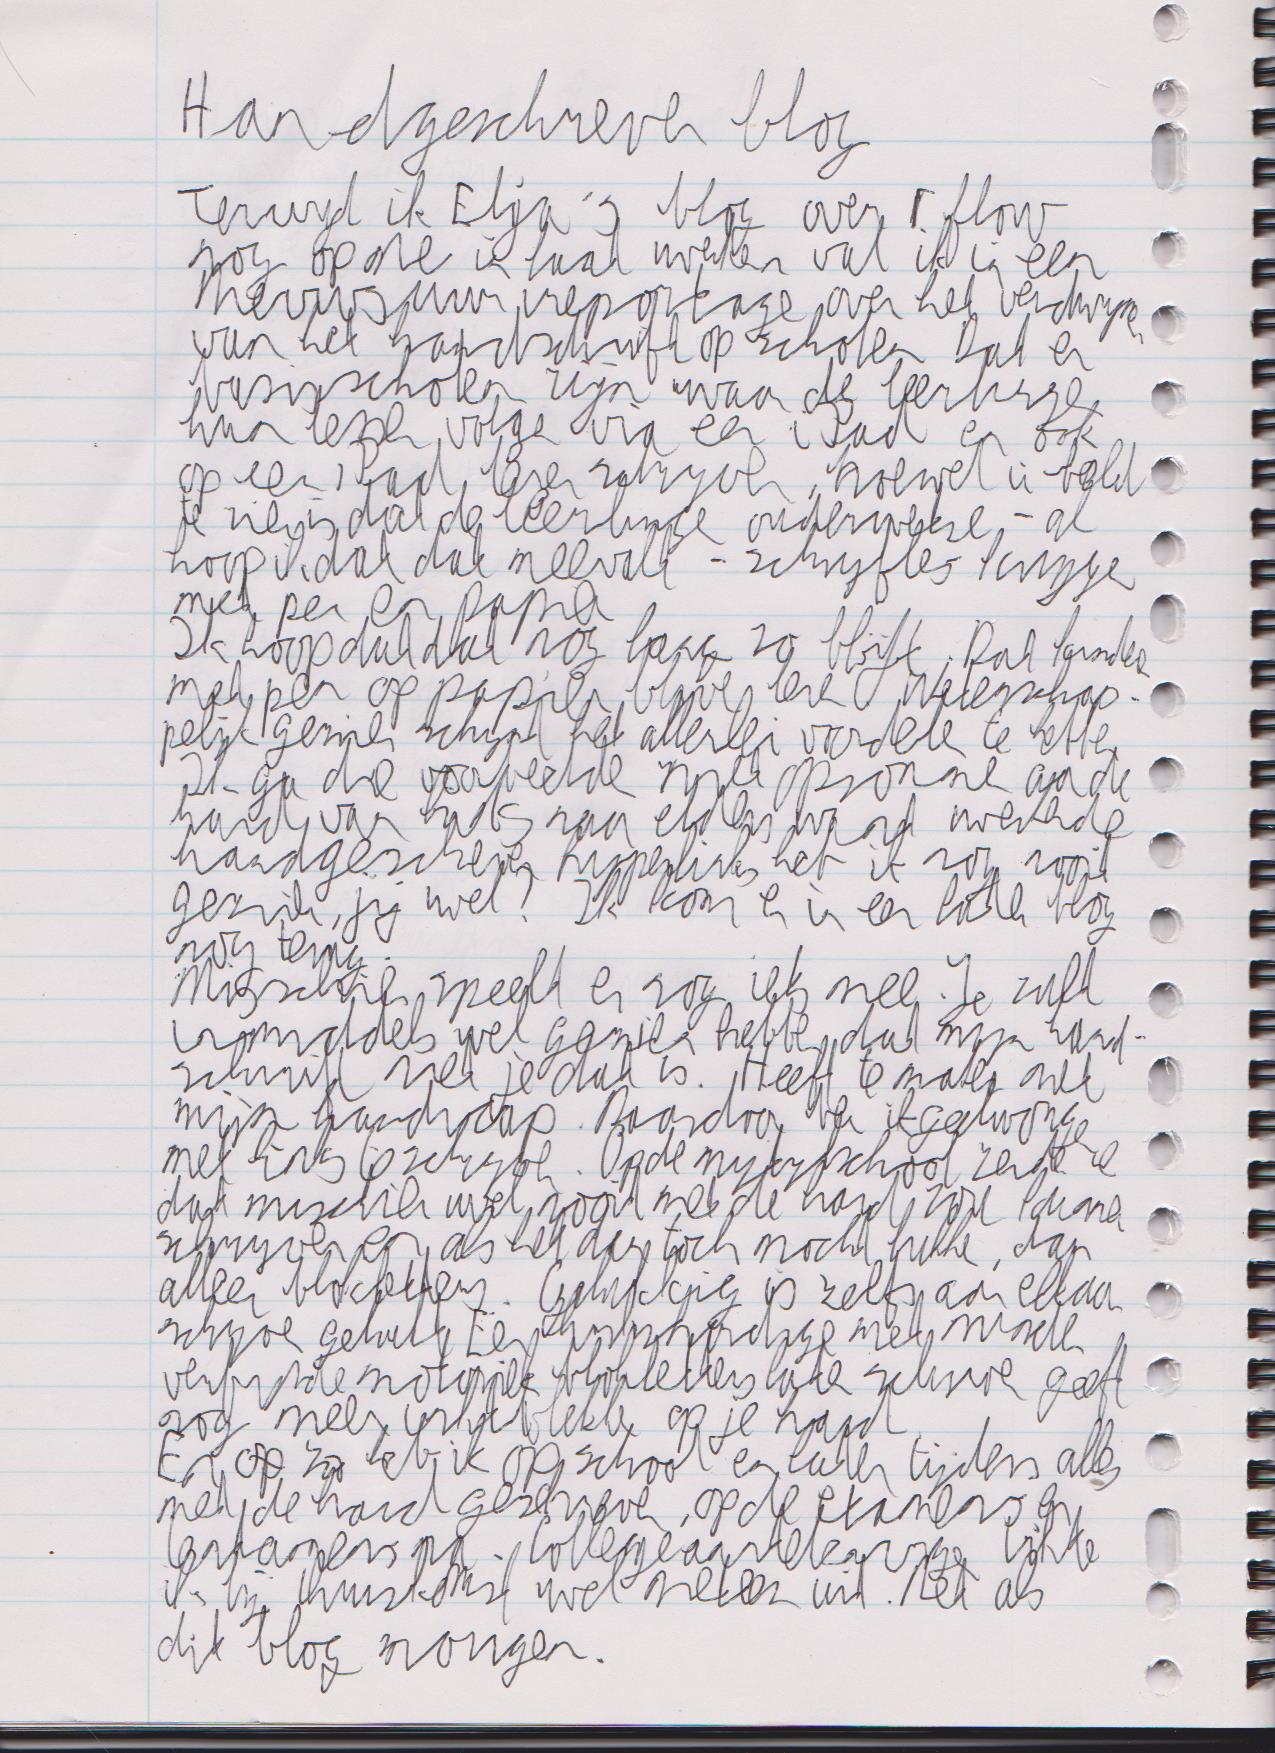 handgeschreven blog